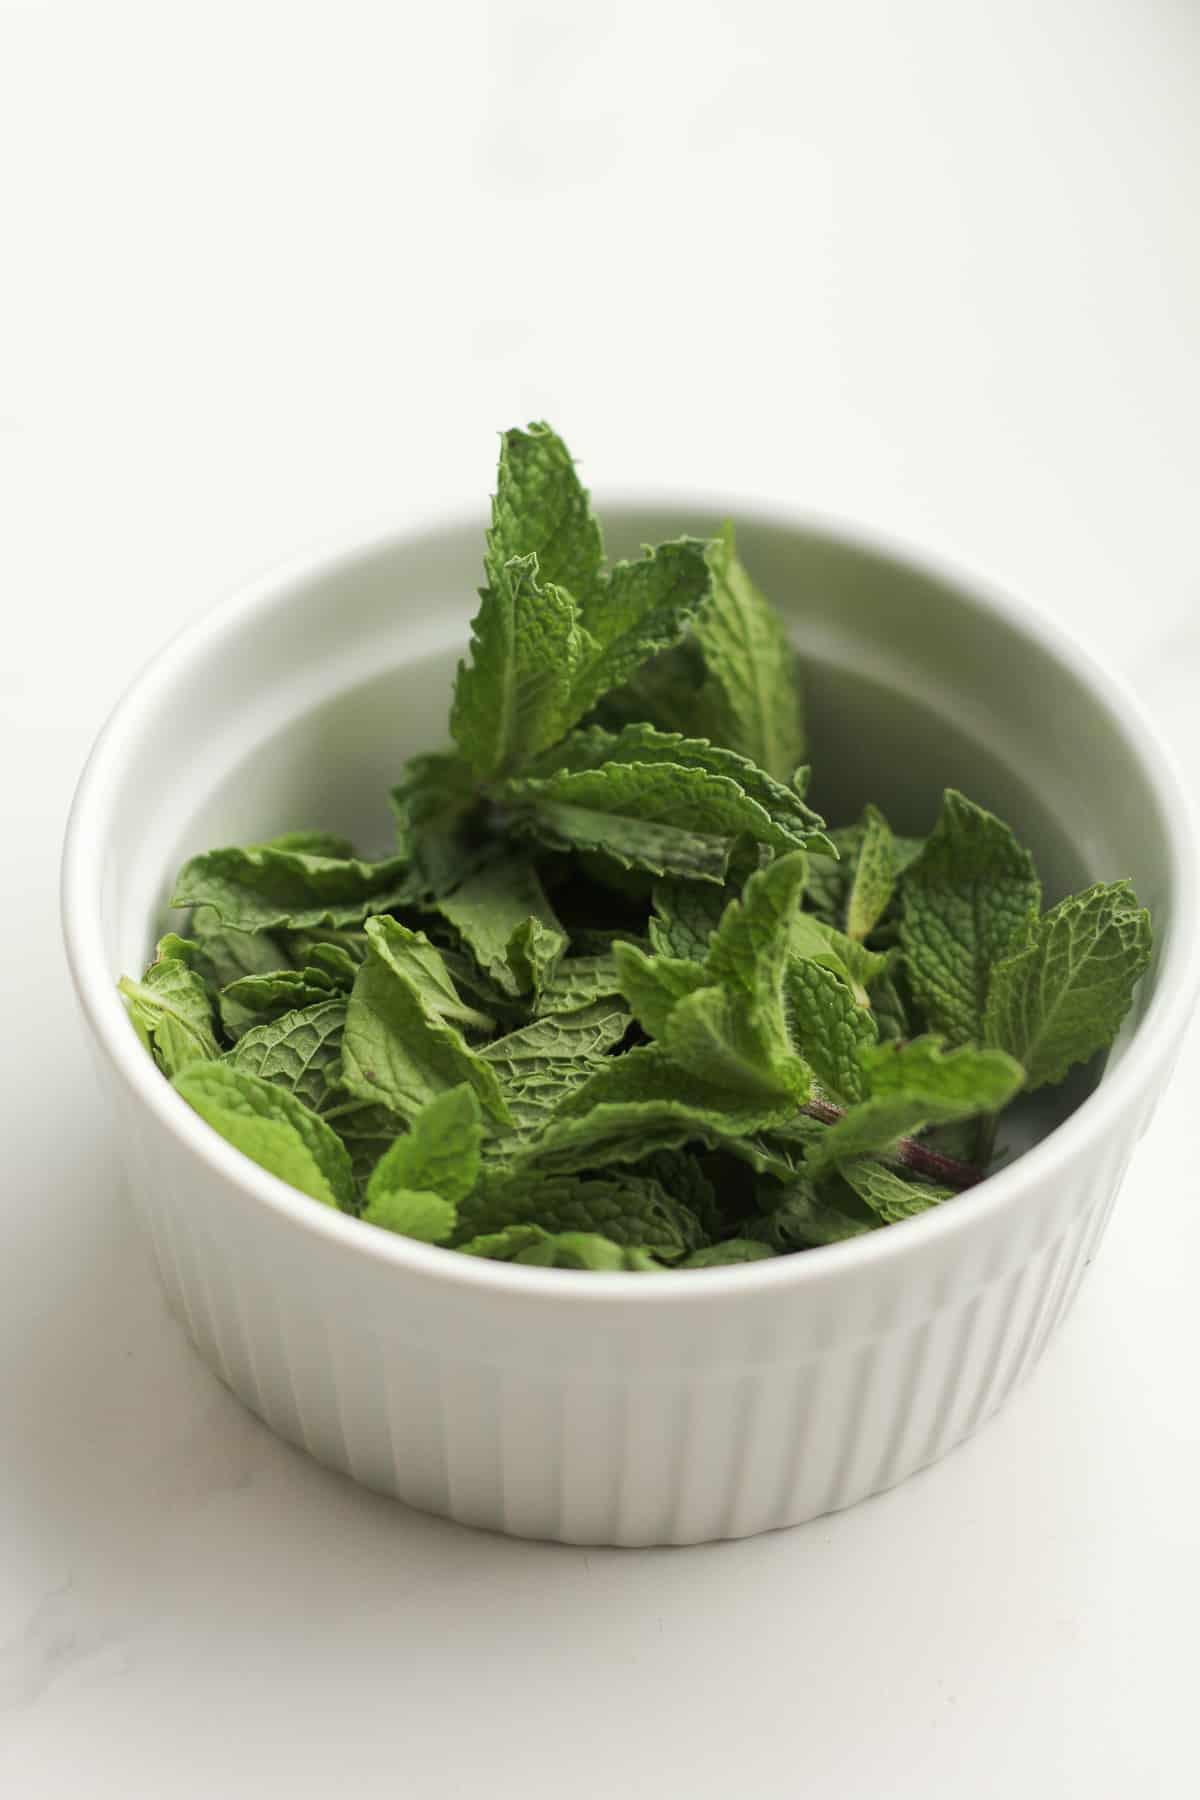 A bowl of fresh mint leaves.